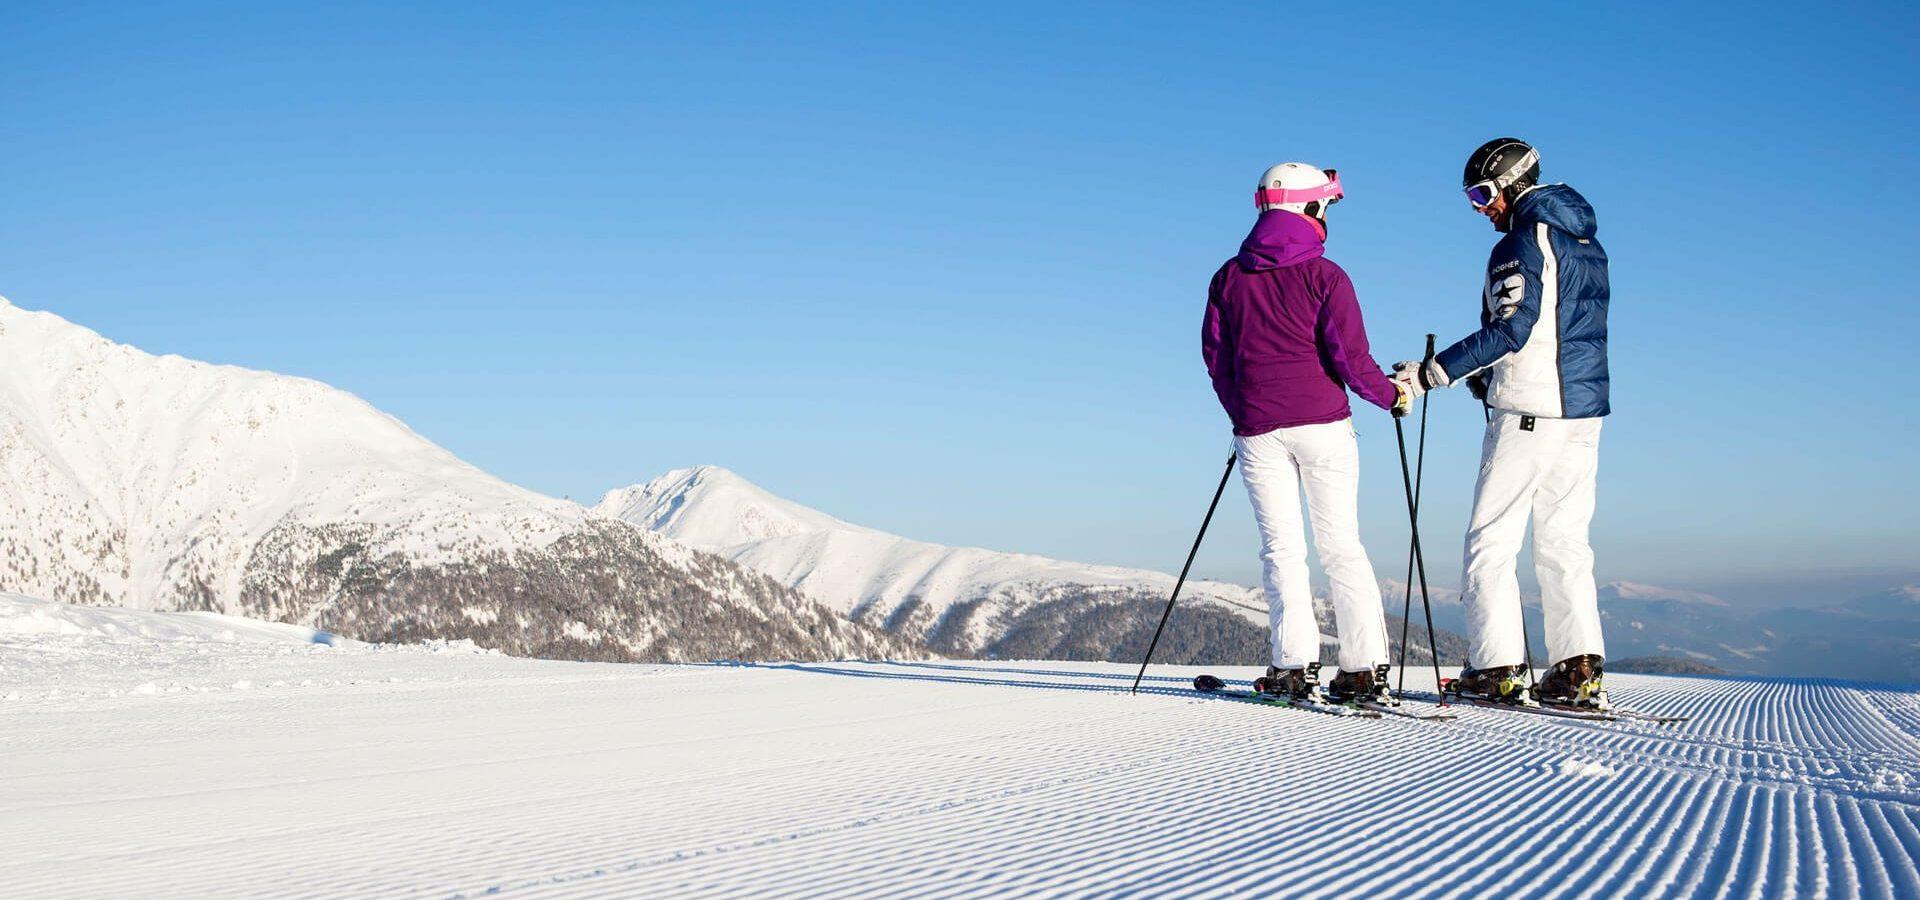 langlaufen-winterurlaub-suedtirol